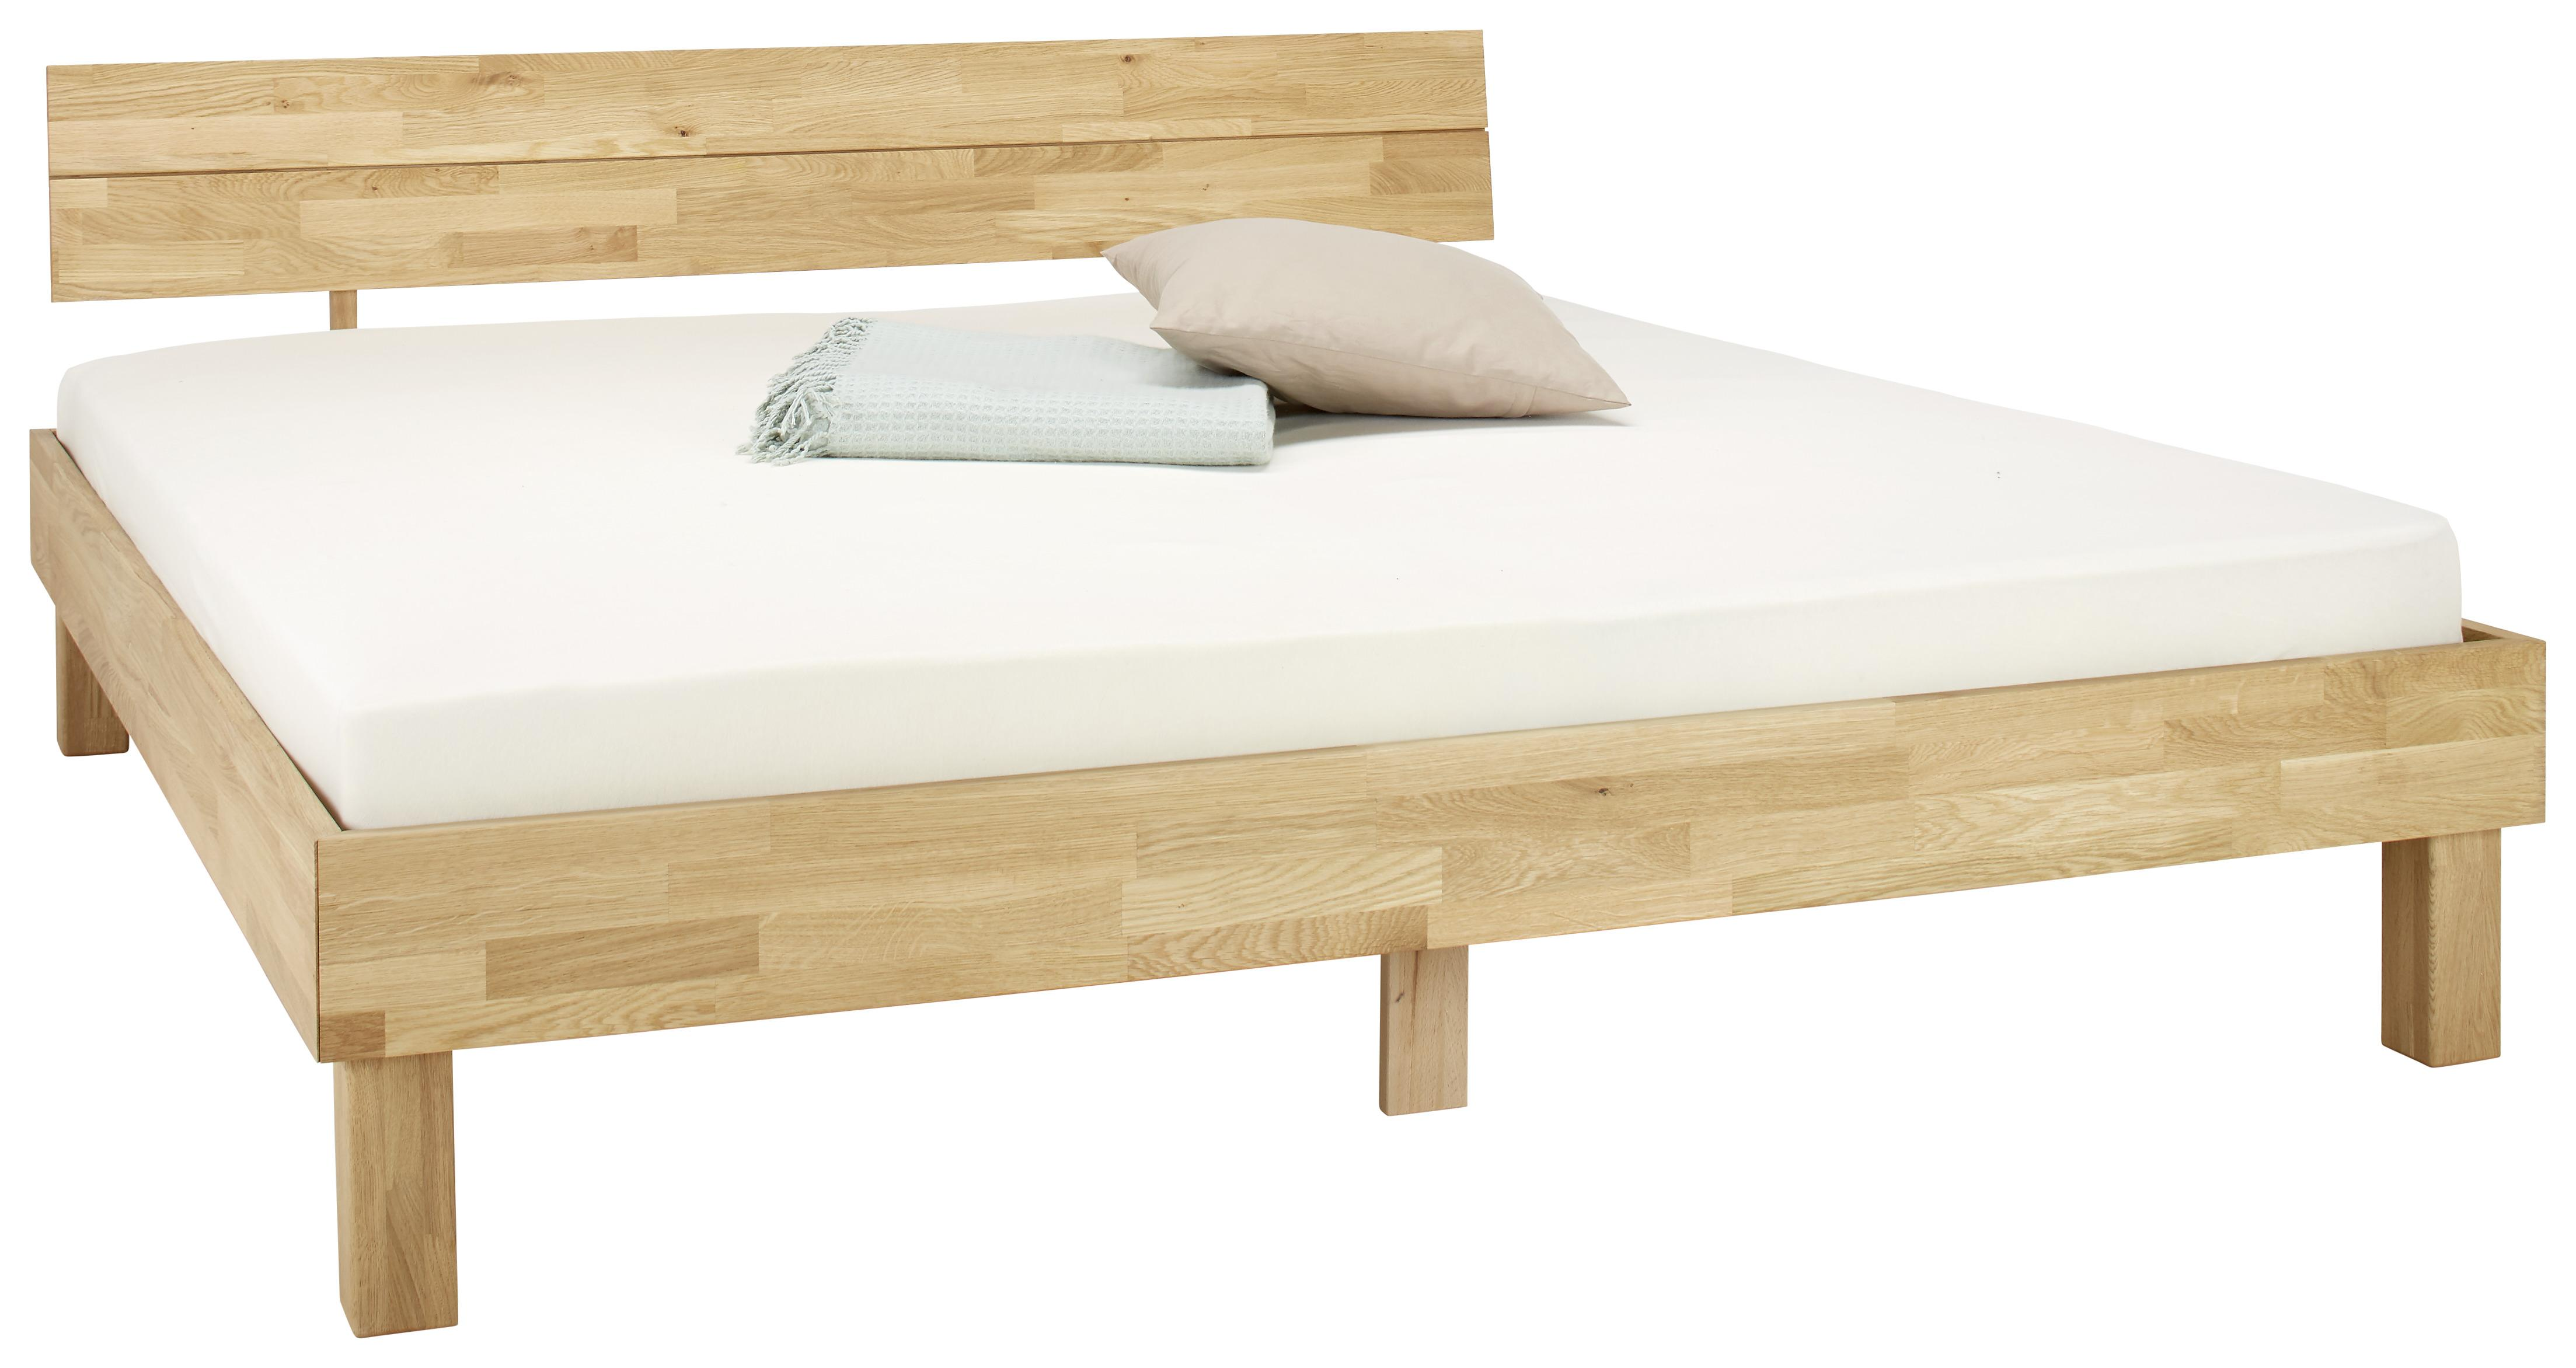 Image of Bett aus Eiche massiv ca. 180x200cm